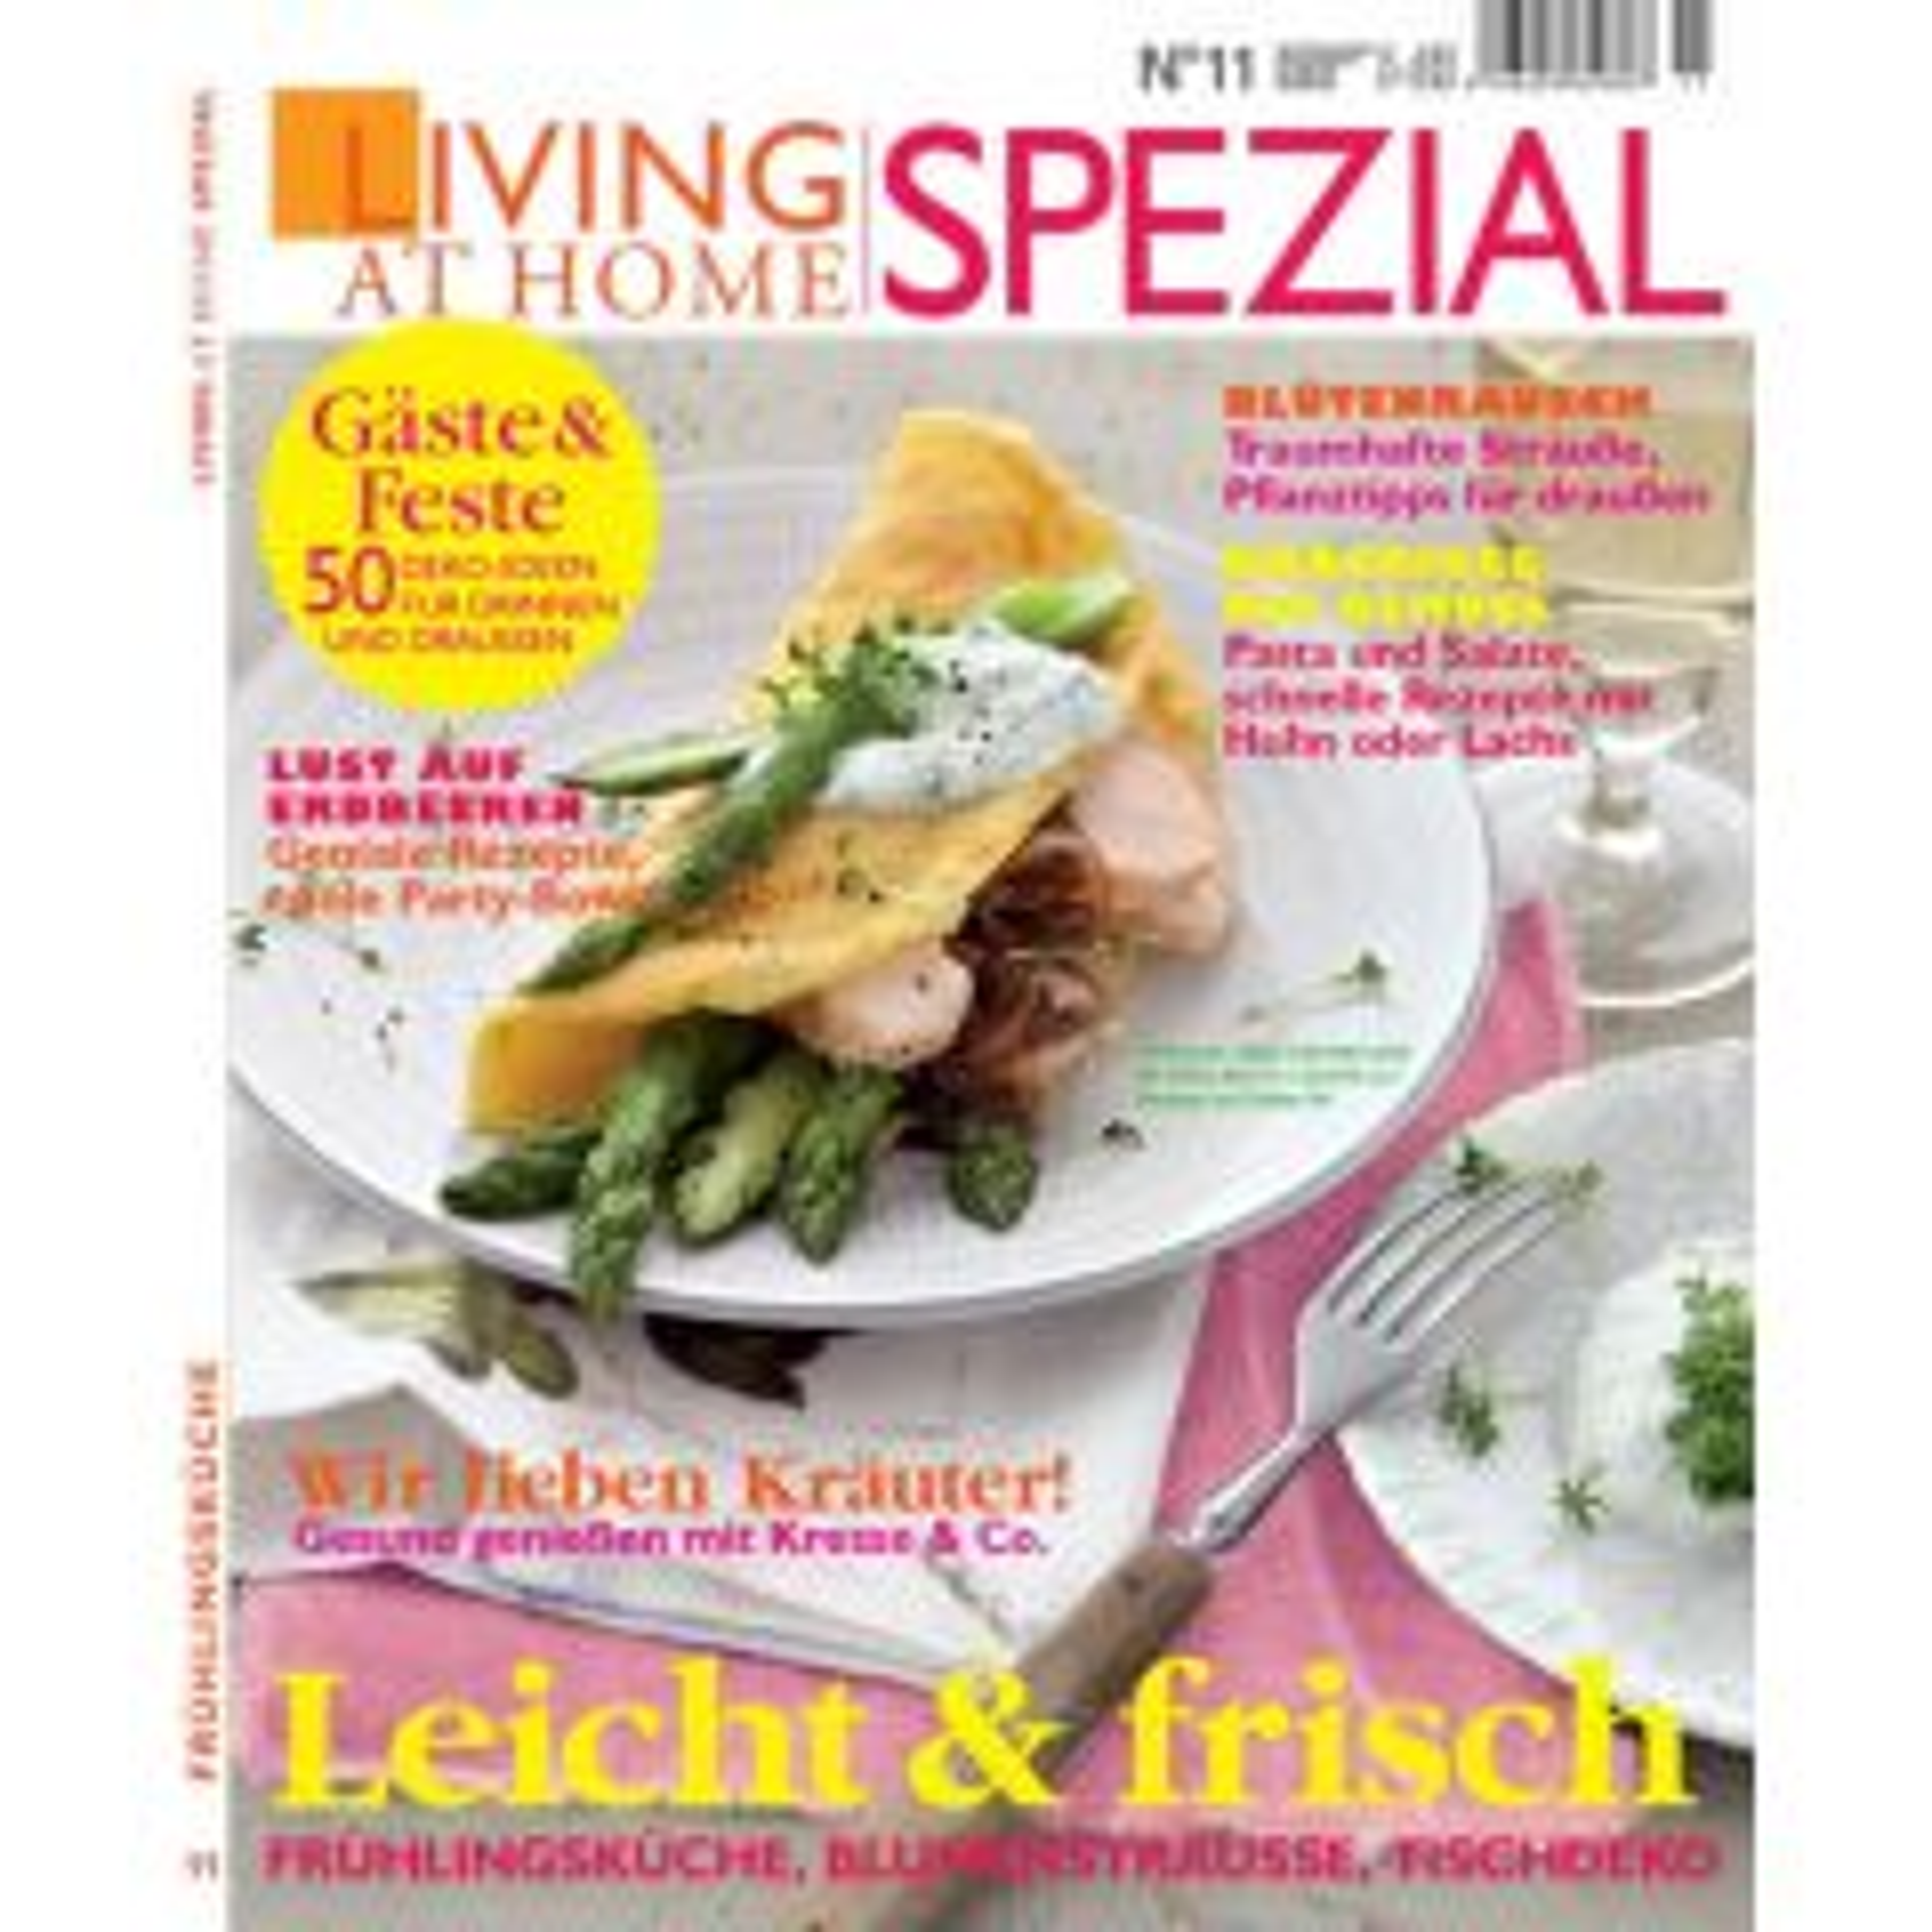 Living at Home Spezial 11/2013 - Leicht & frisch